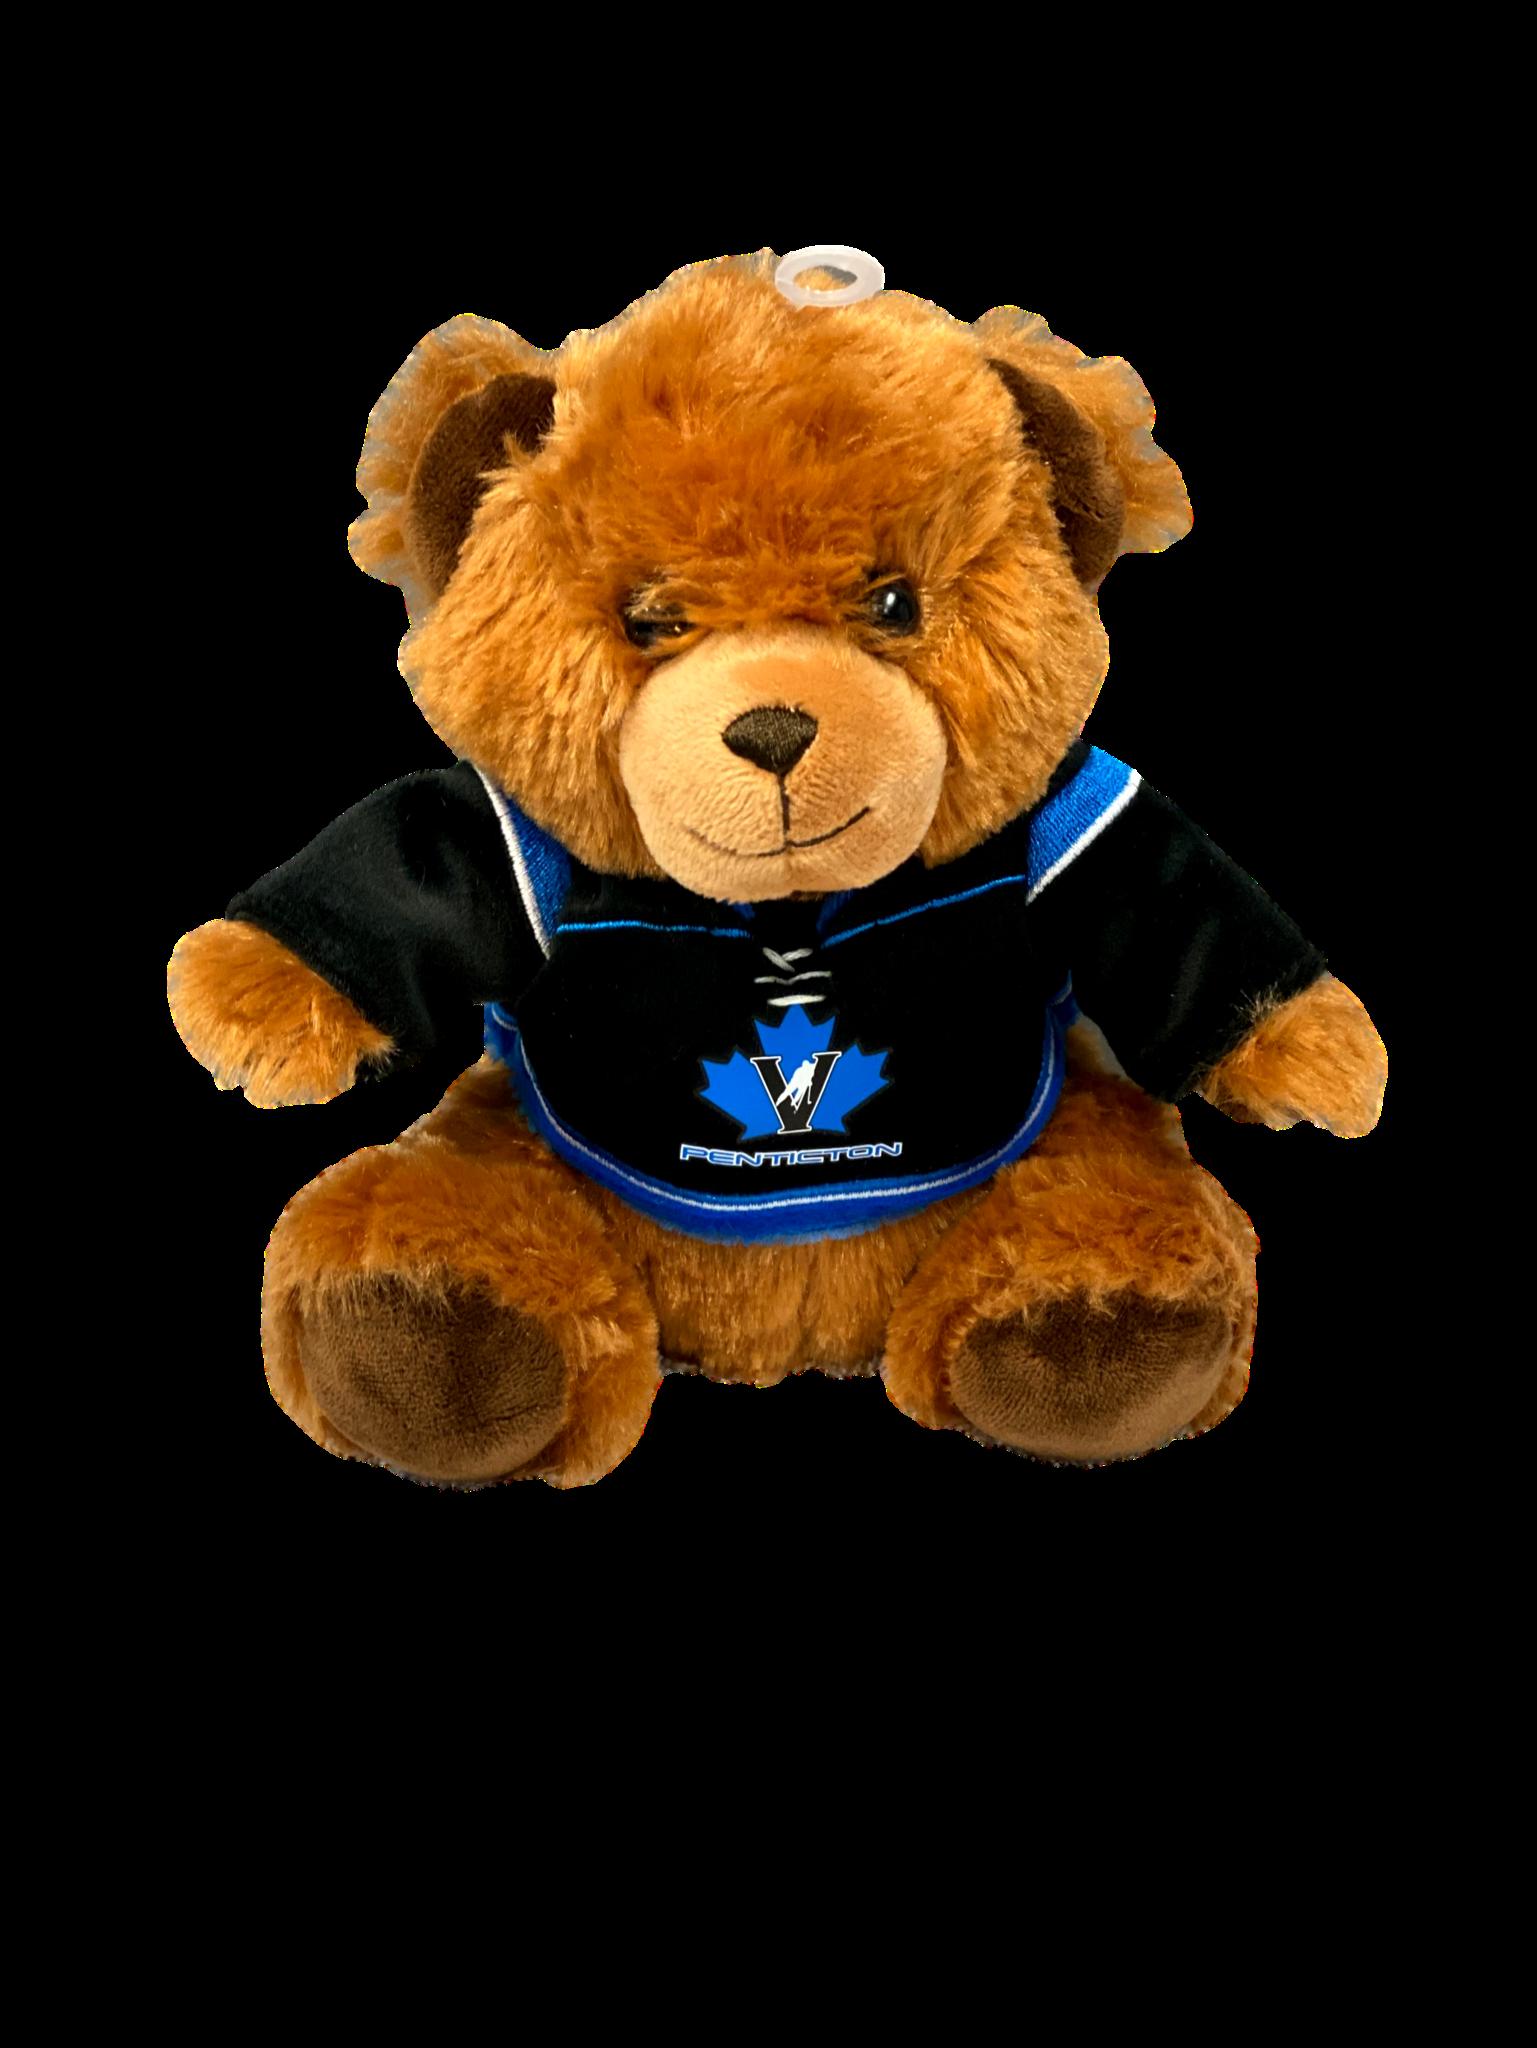 Vees Jersey Bear stuffie